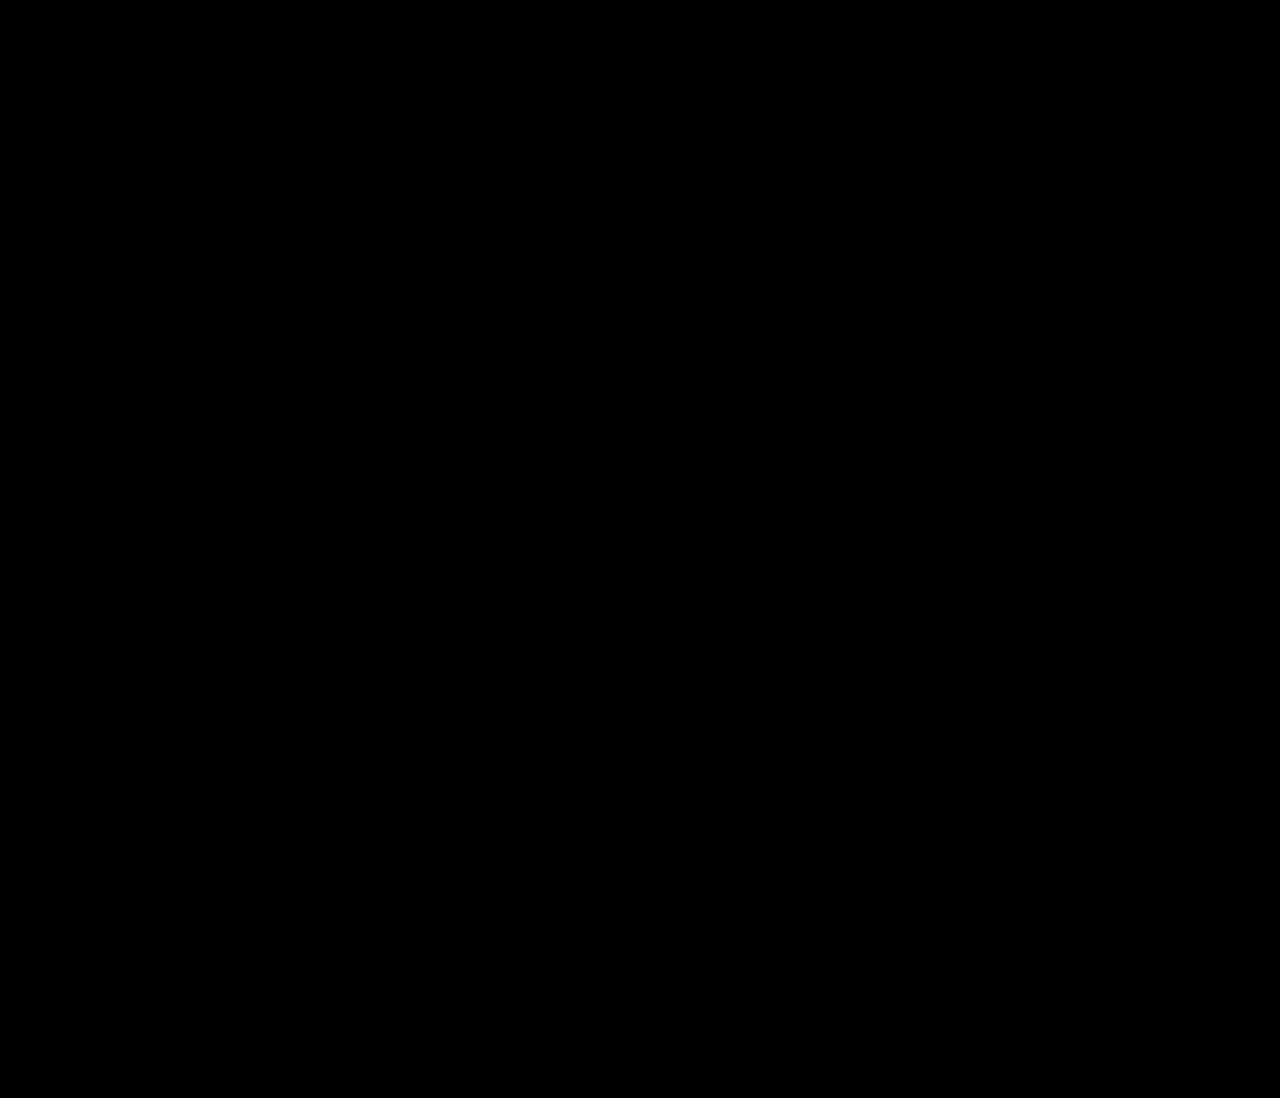 Pin On Mandalas Doodles Coloring Pages [ 1098 x 1280 Pixel ]